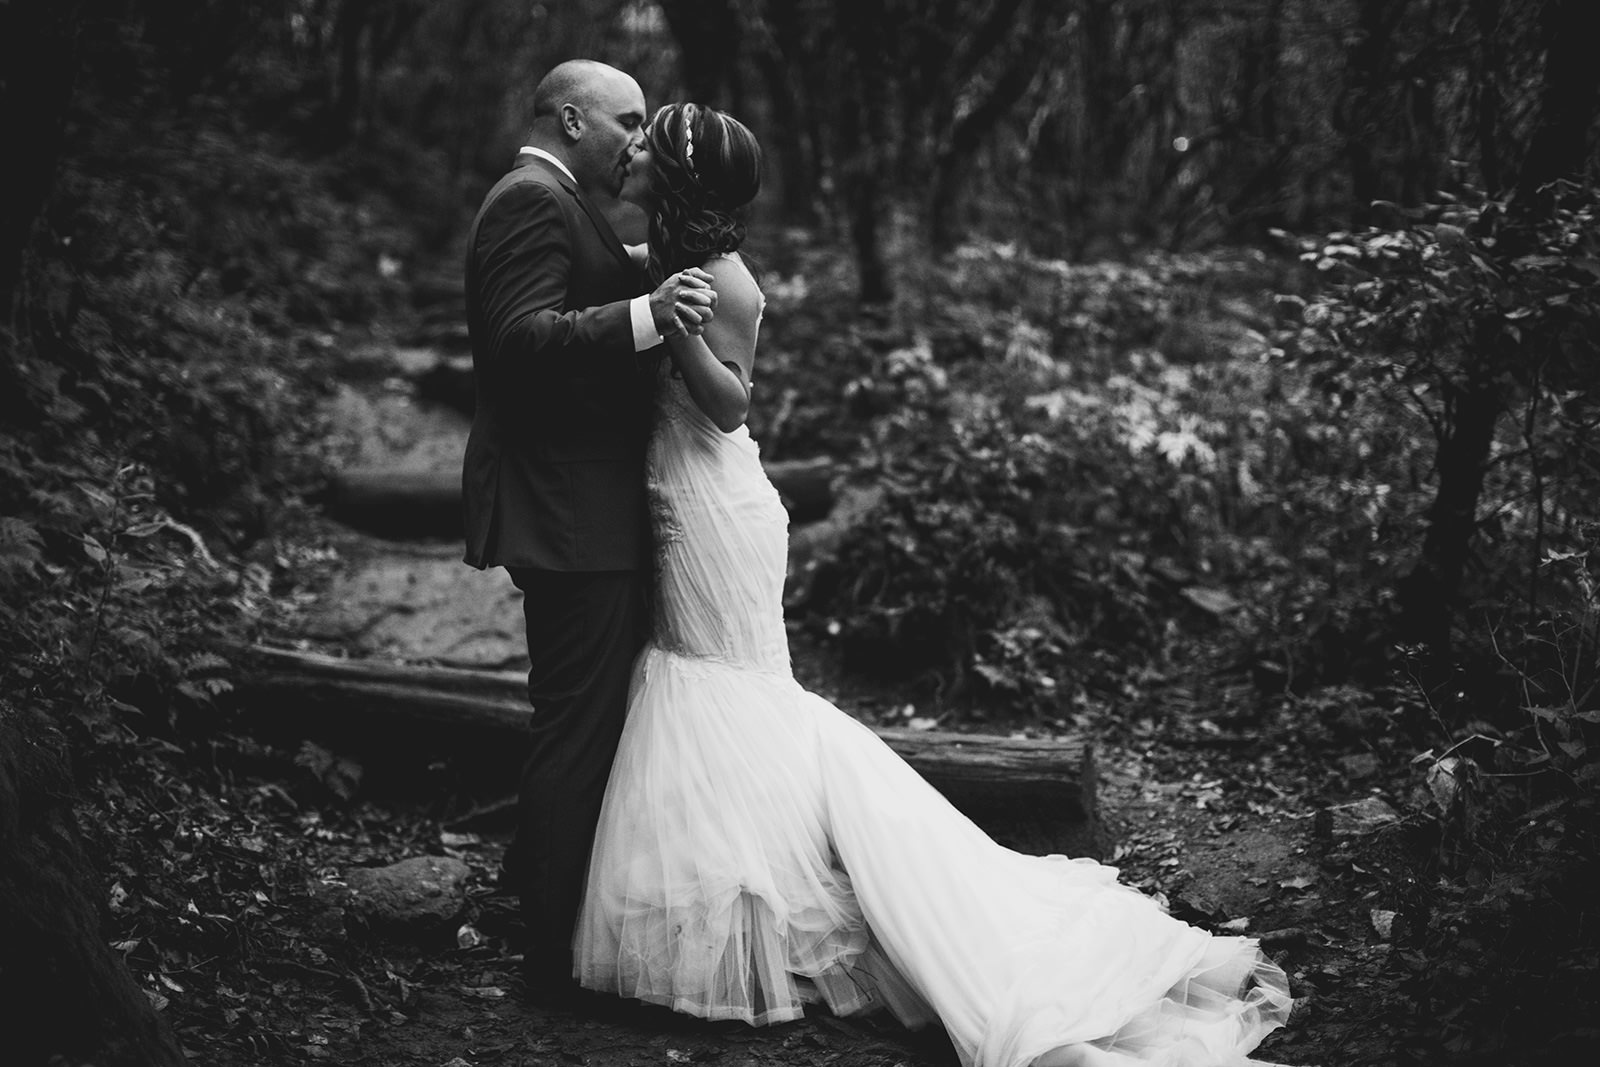 rainy elopement at craggy gardens